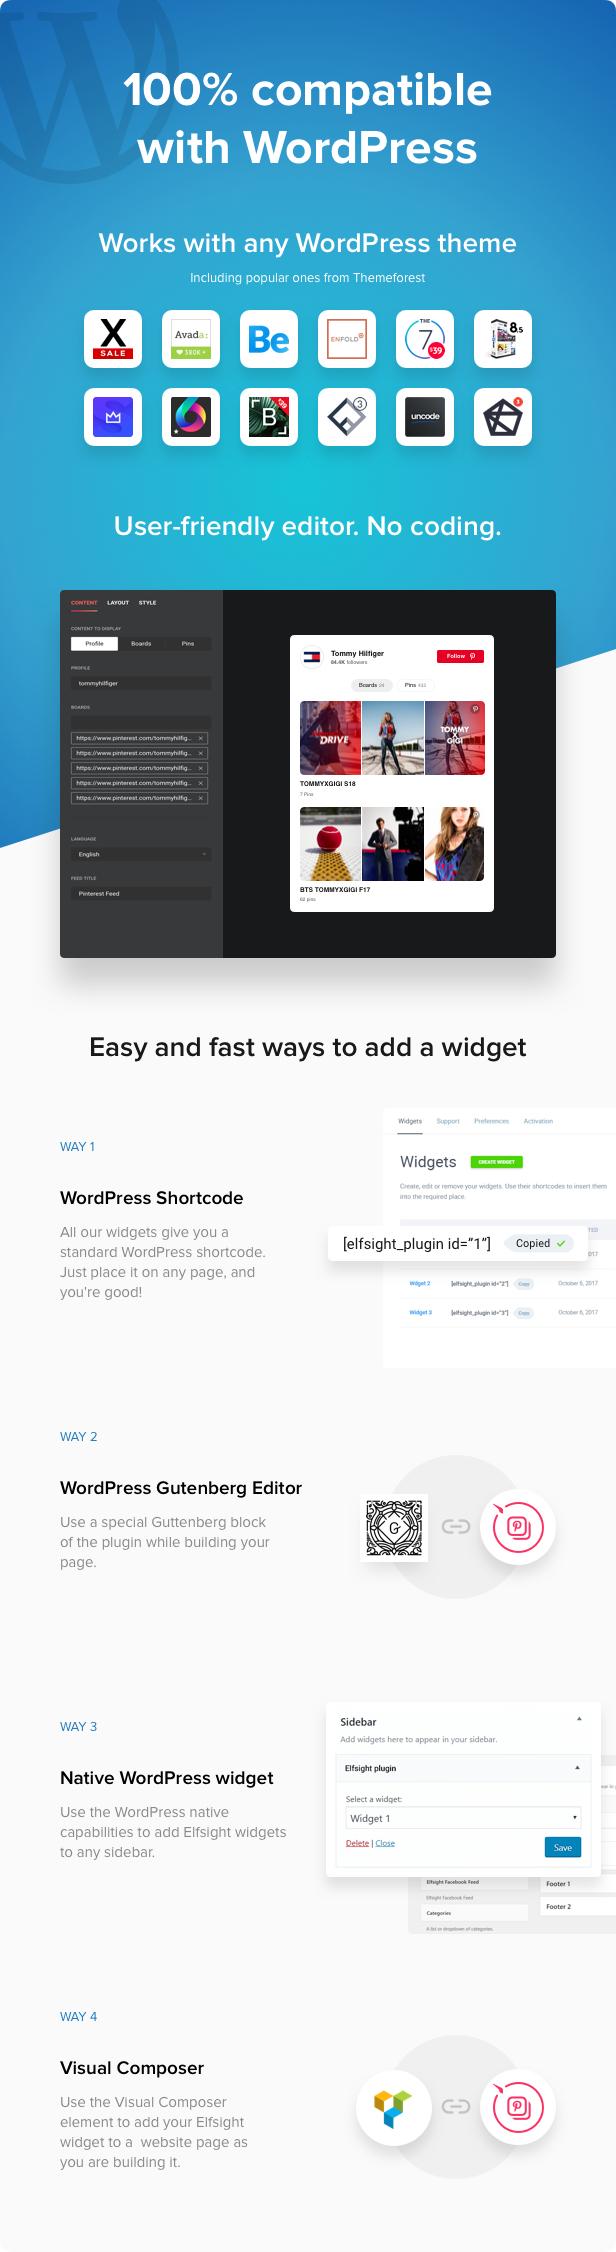 pinterest-feed-description-wordpress-support.jpg